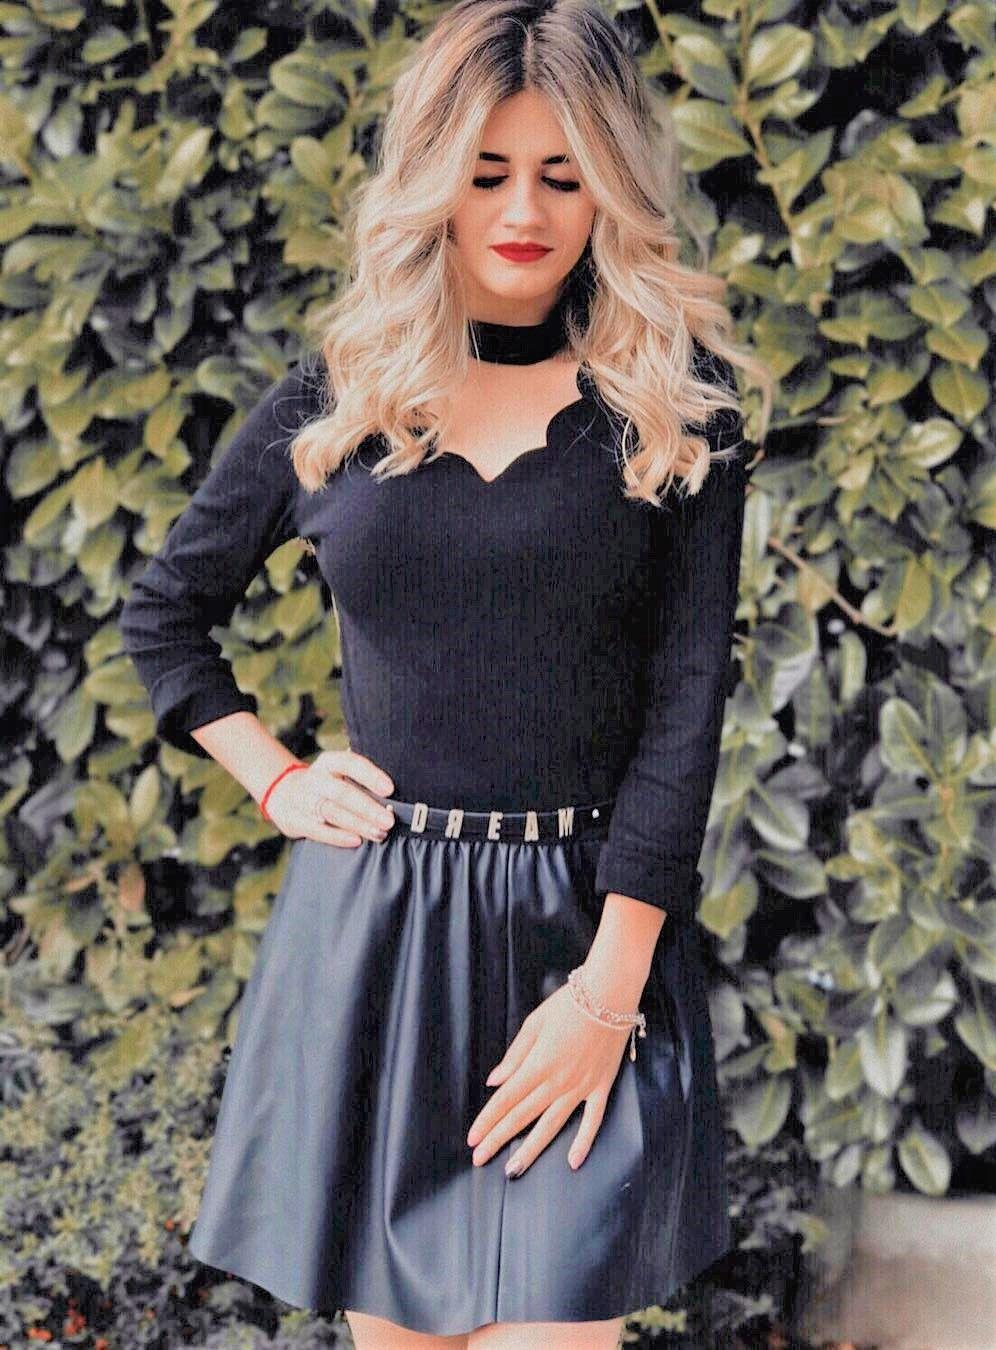 cf699fa786 SHEIN Black Workwear Elegant Scallop Trim Solid V Neck Long Sleeve Skinny  Tee